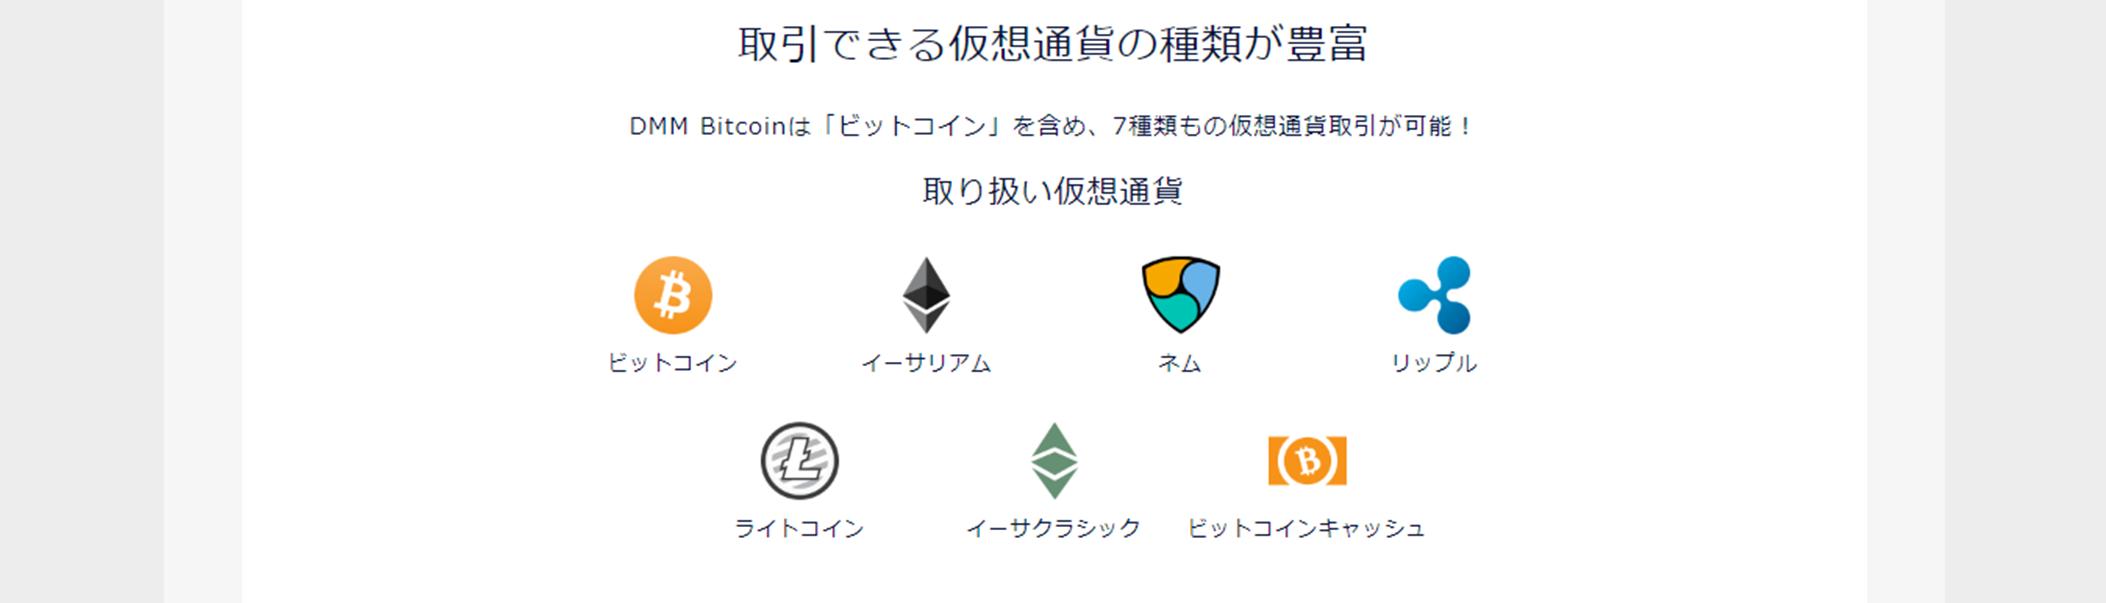 DMMビットコインのレバレッジ可能なアルトコイン